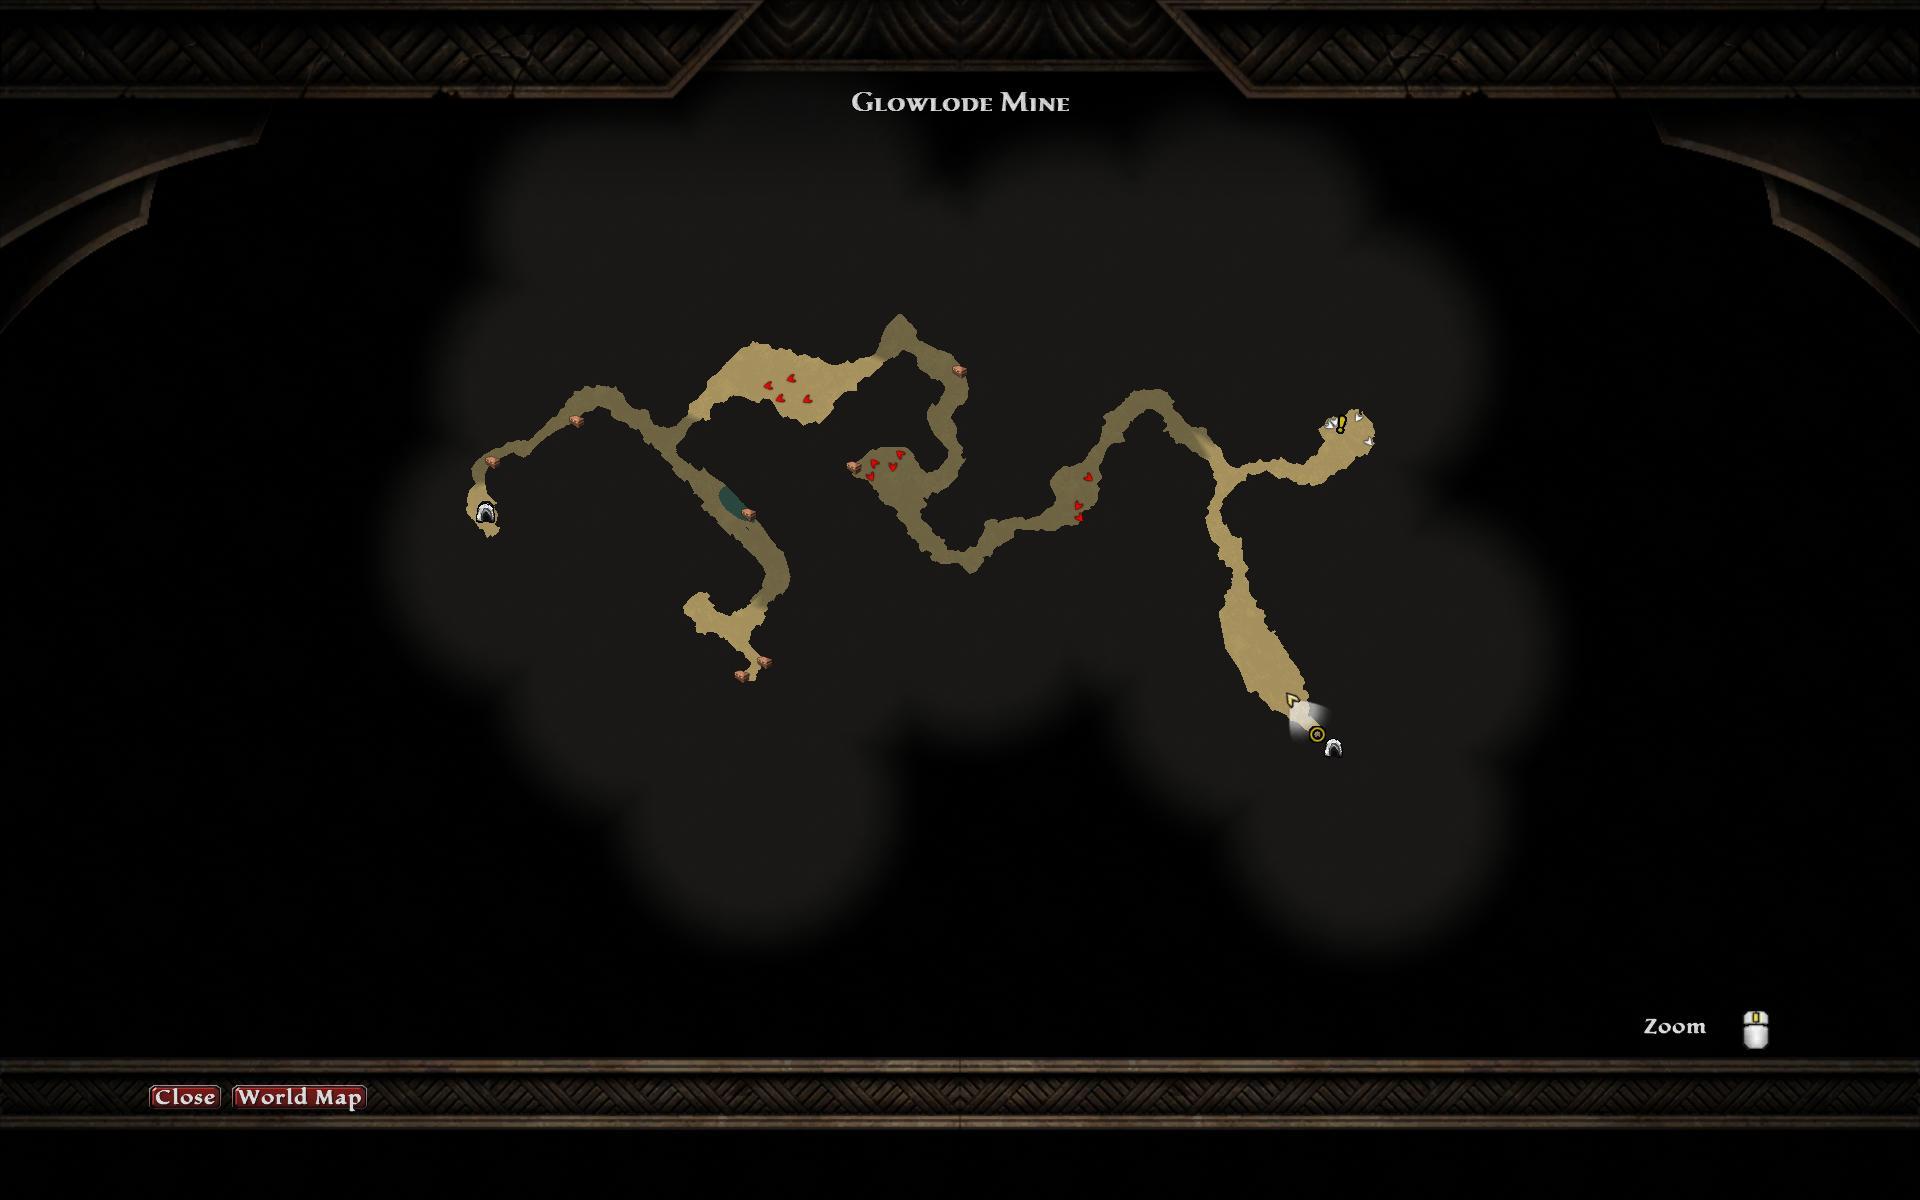 Glowlode Mine Features Map.jpg